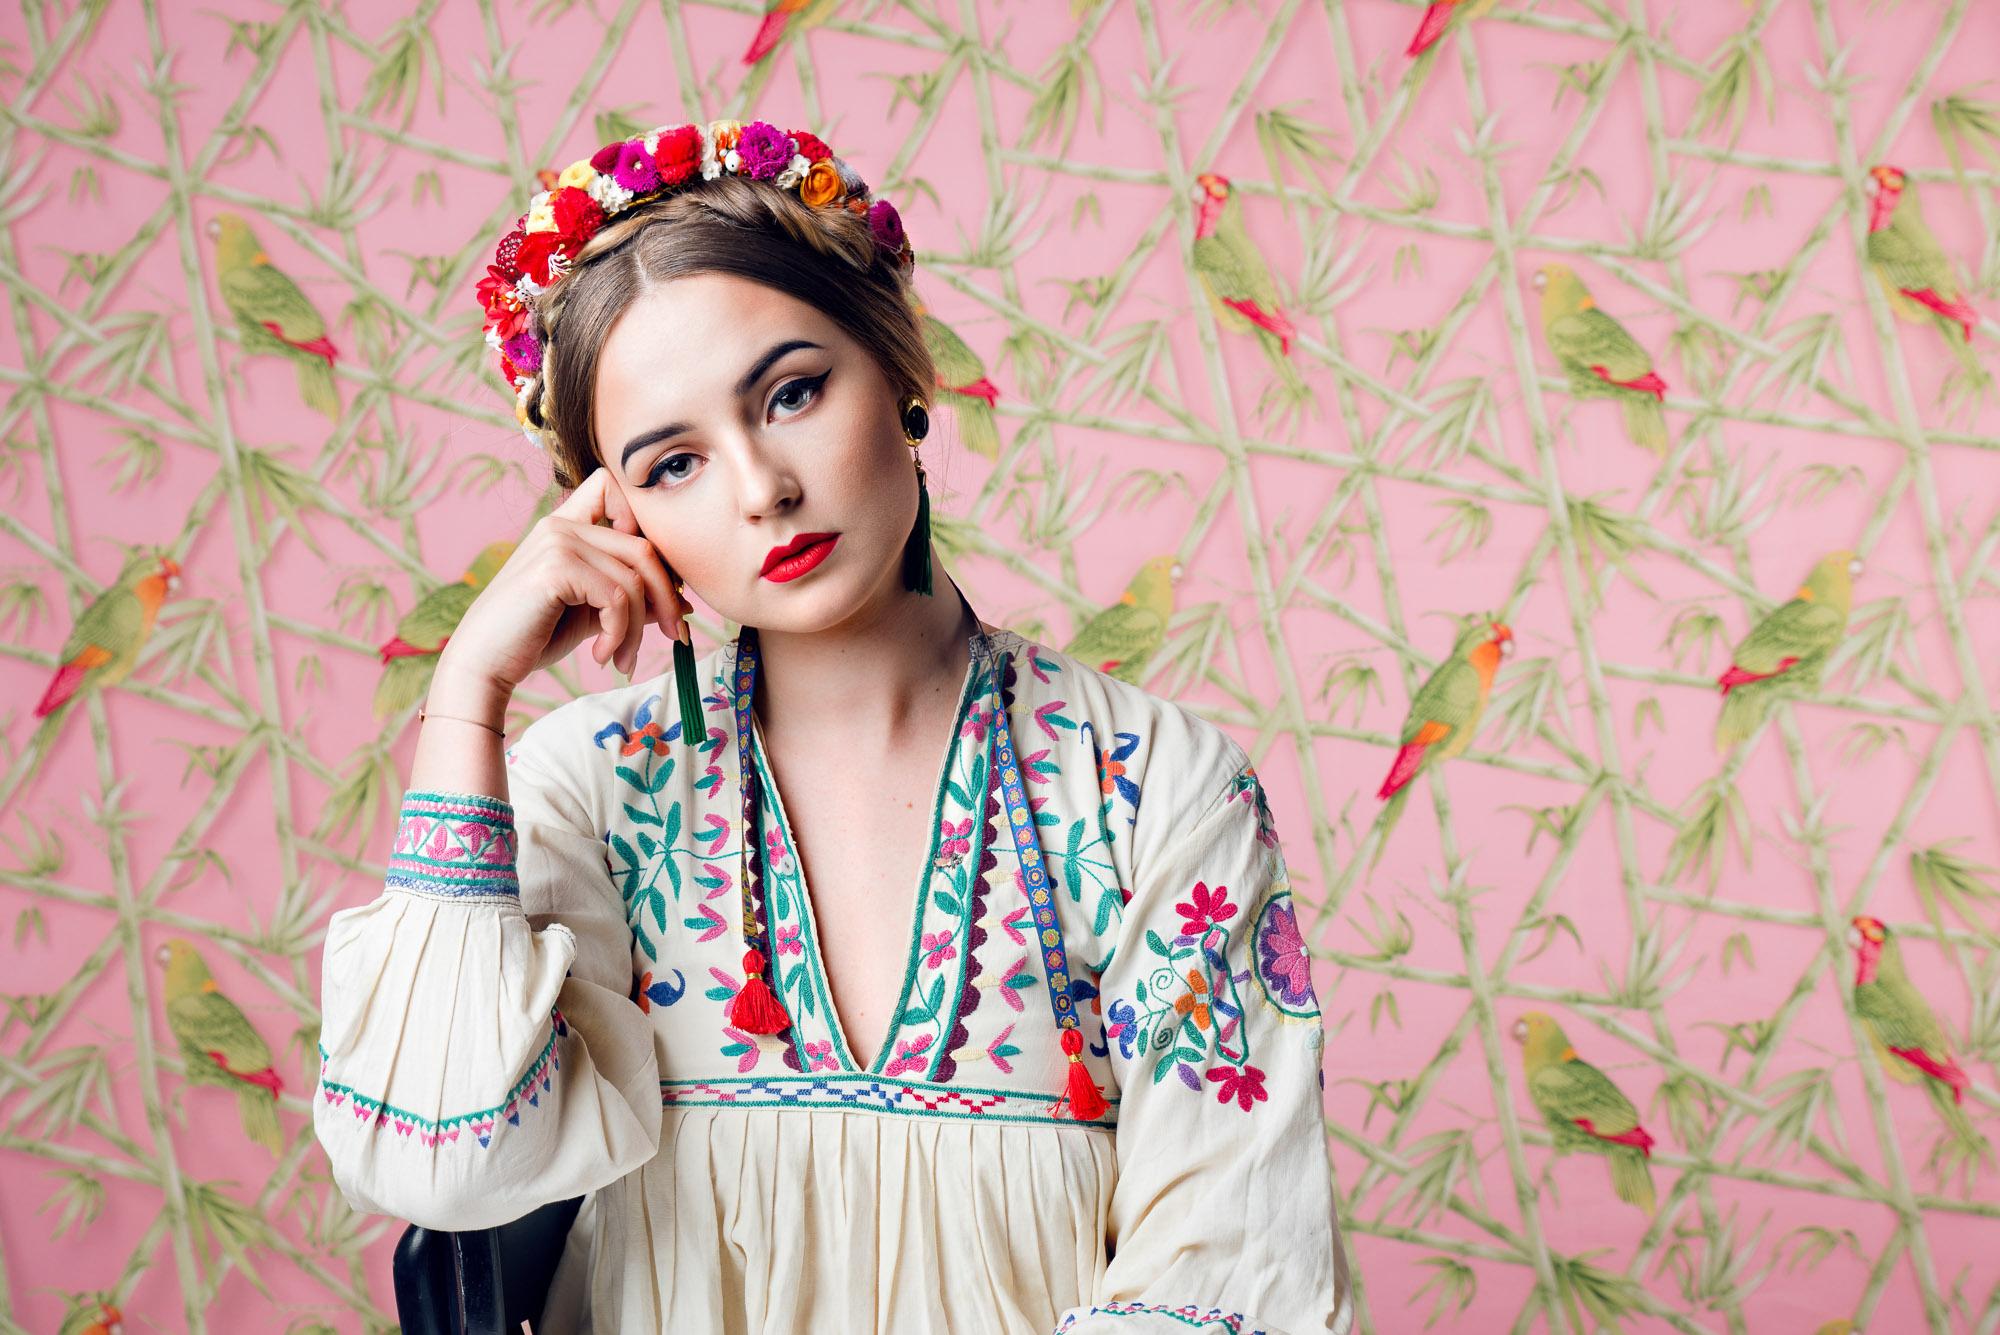 WeAreFlowergirls_SS16_Flowercrown_585-Laura+Karasinski_Lola_€95